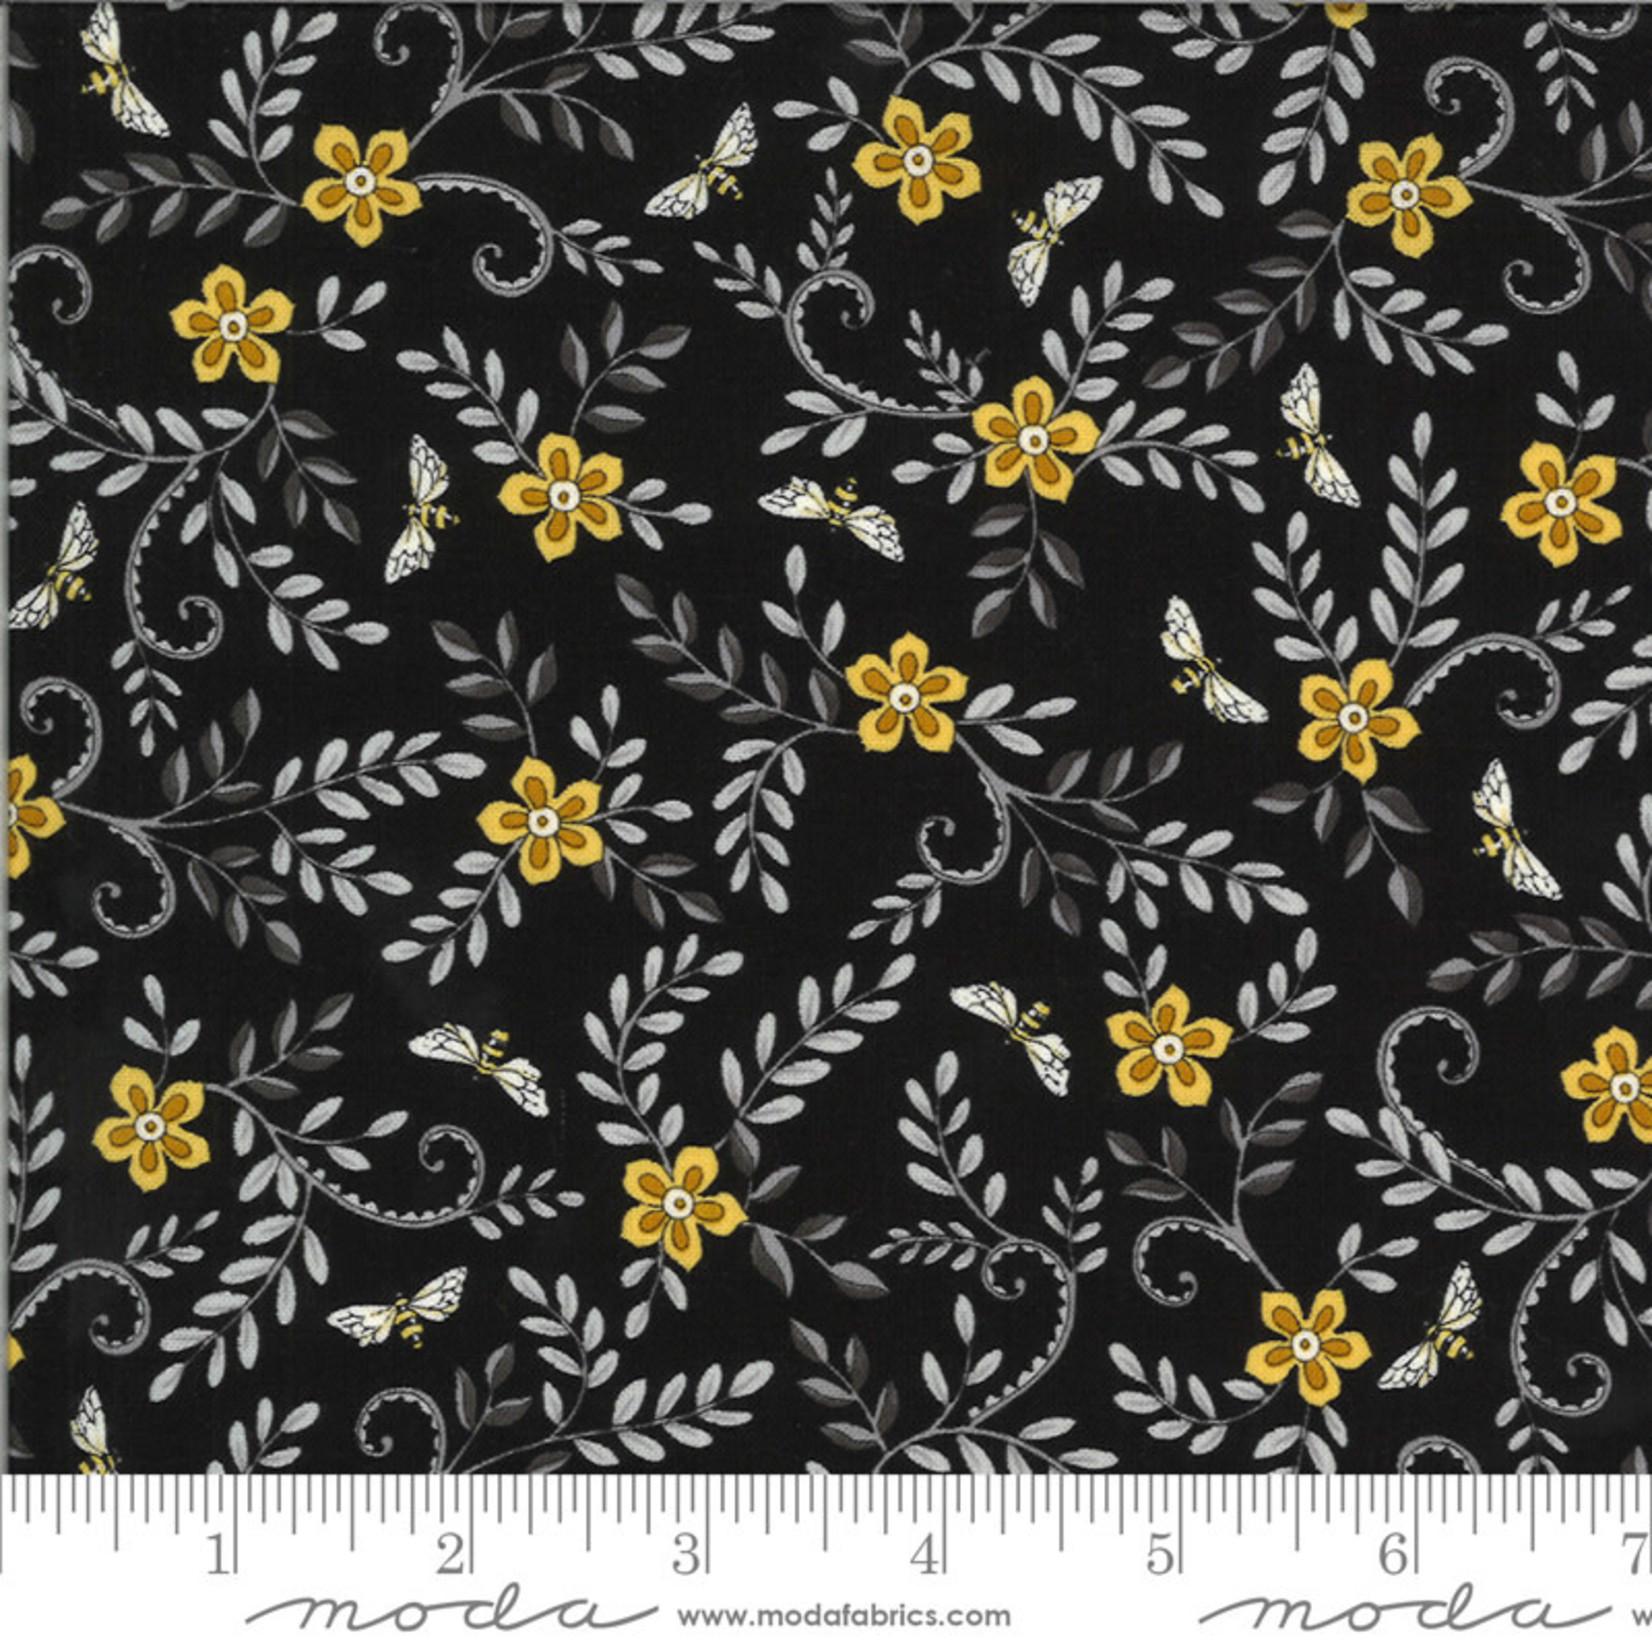 Deb Strain BEE GRATEFUL, FLOWER VINES AND BEES , EBONY (19964 15) PER CM OR $21/M